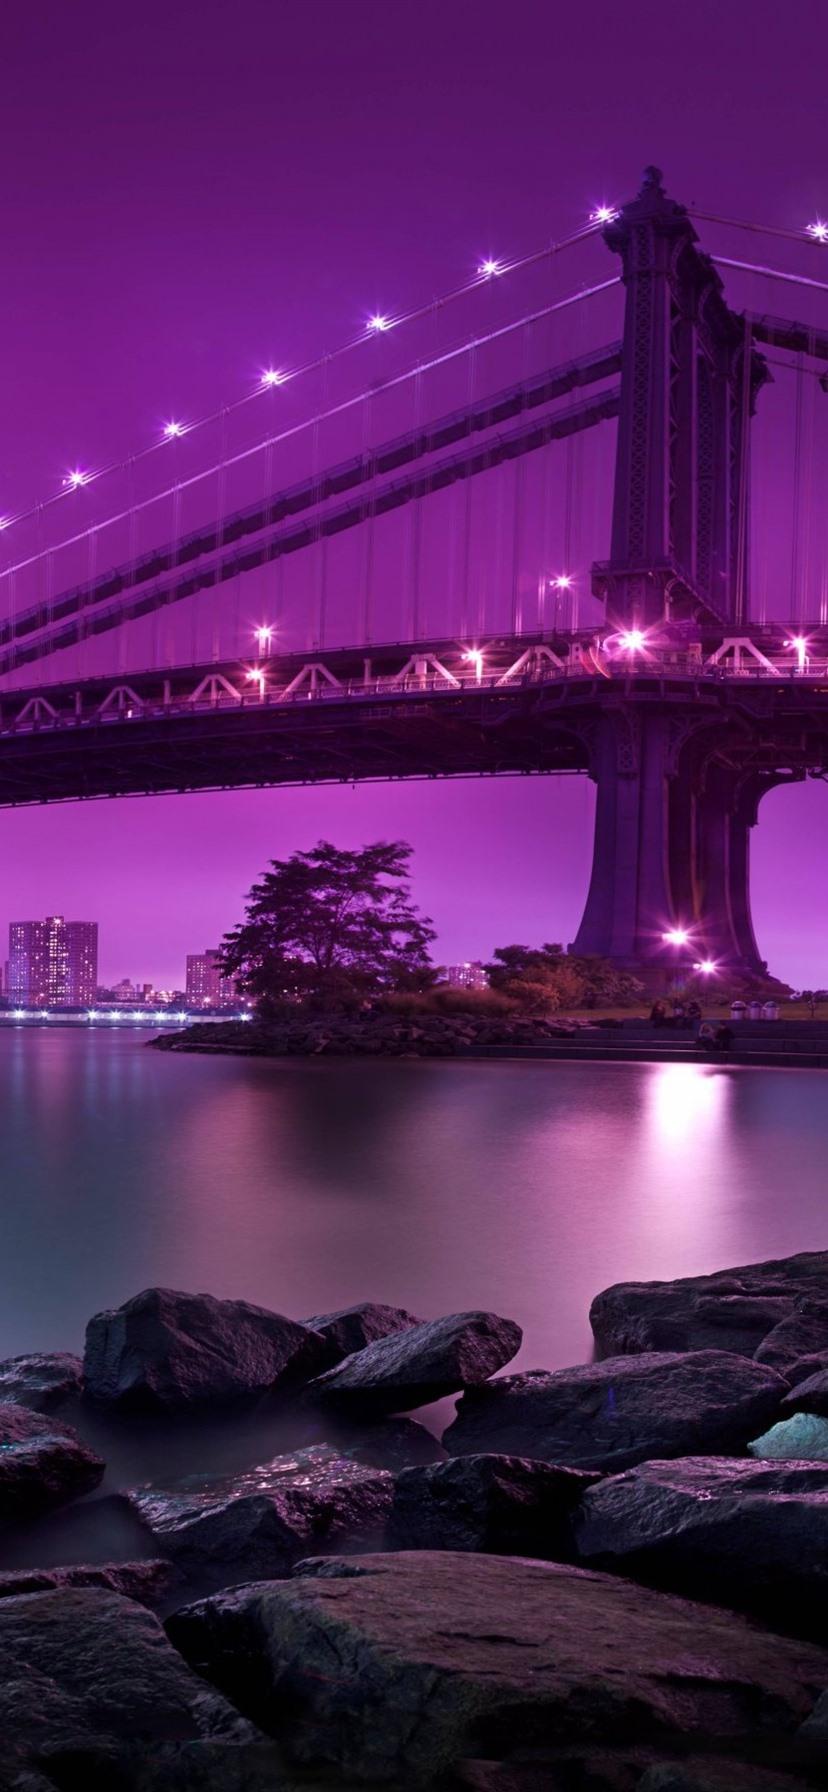 Bridge Lighting River Rocks City Pink Background